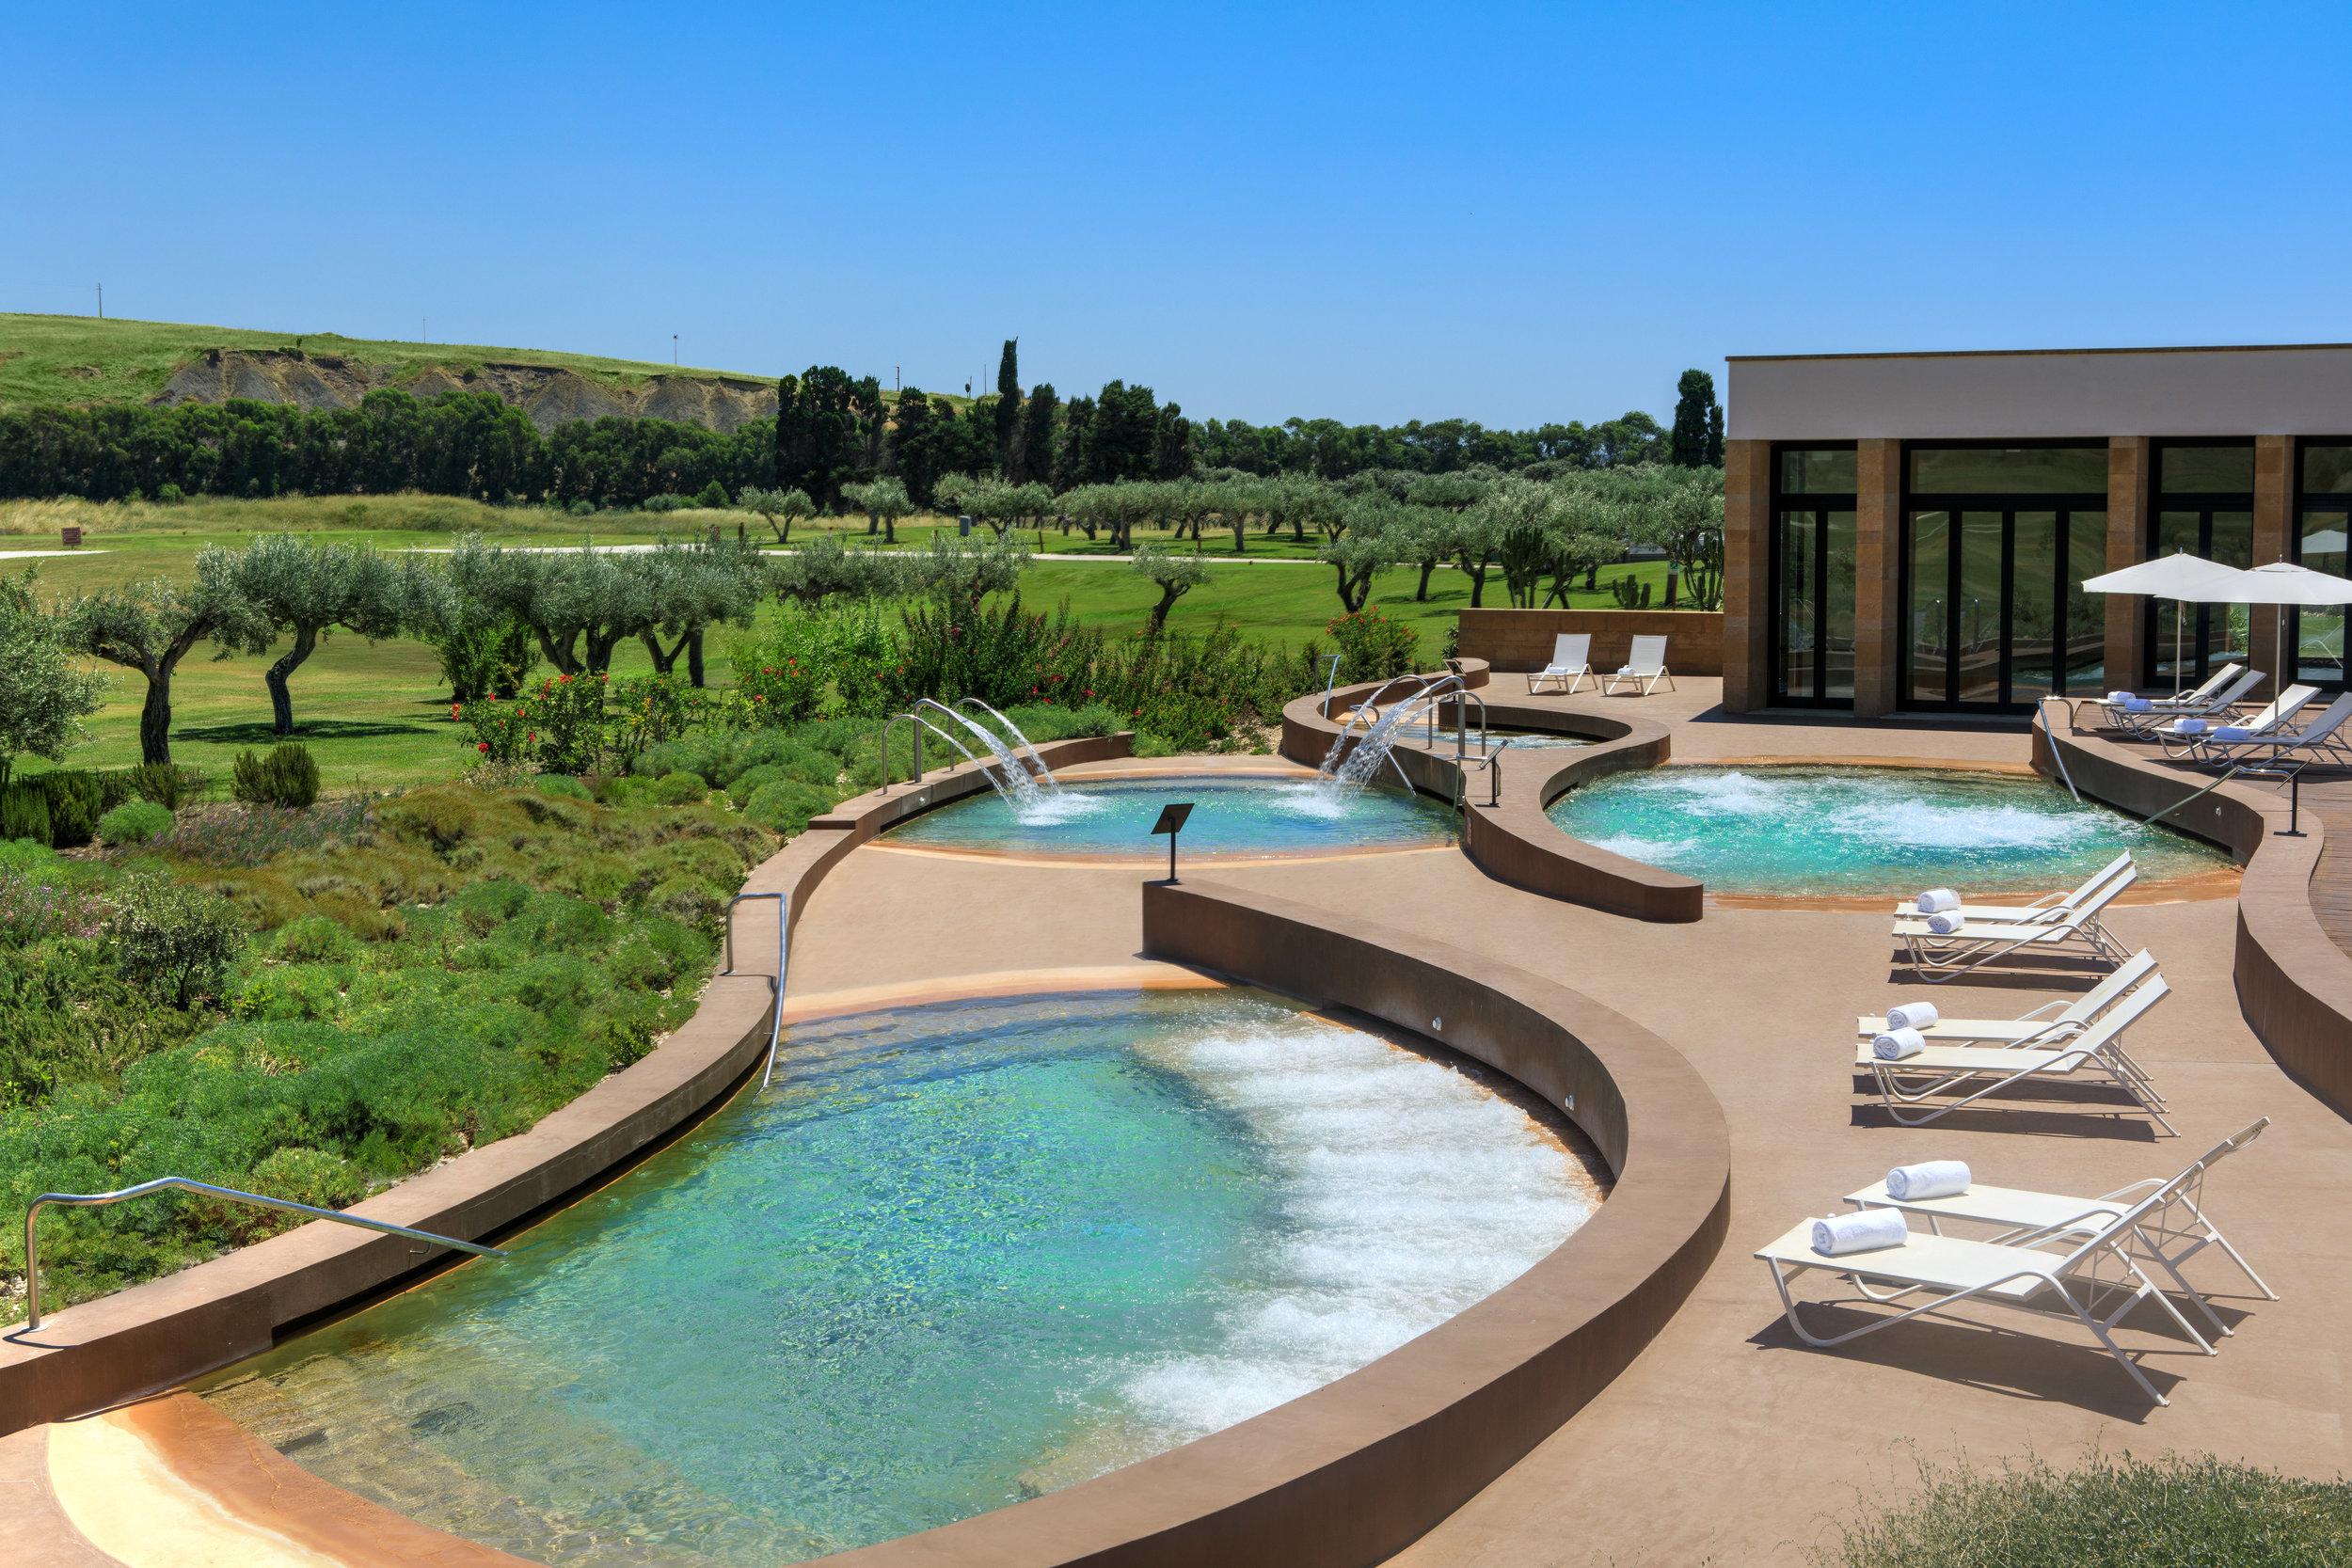 7 RFH Verdura Resort - Verdura Spa Thalassotherapy Pools 4740 Jul 17.JPG